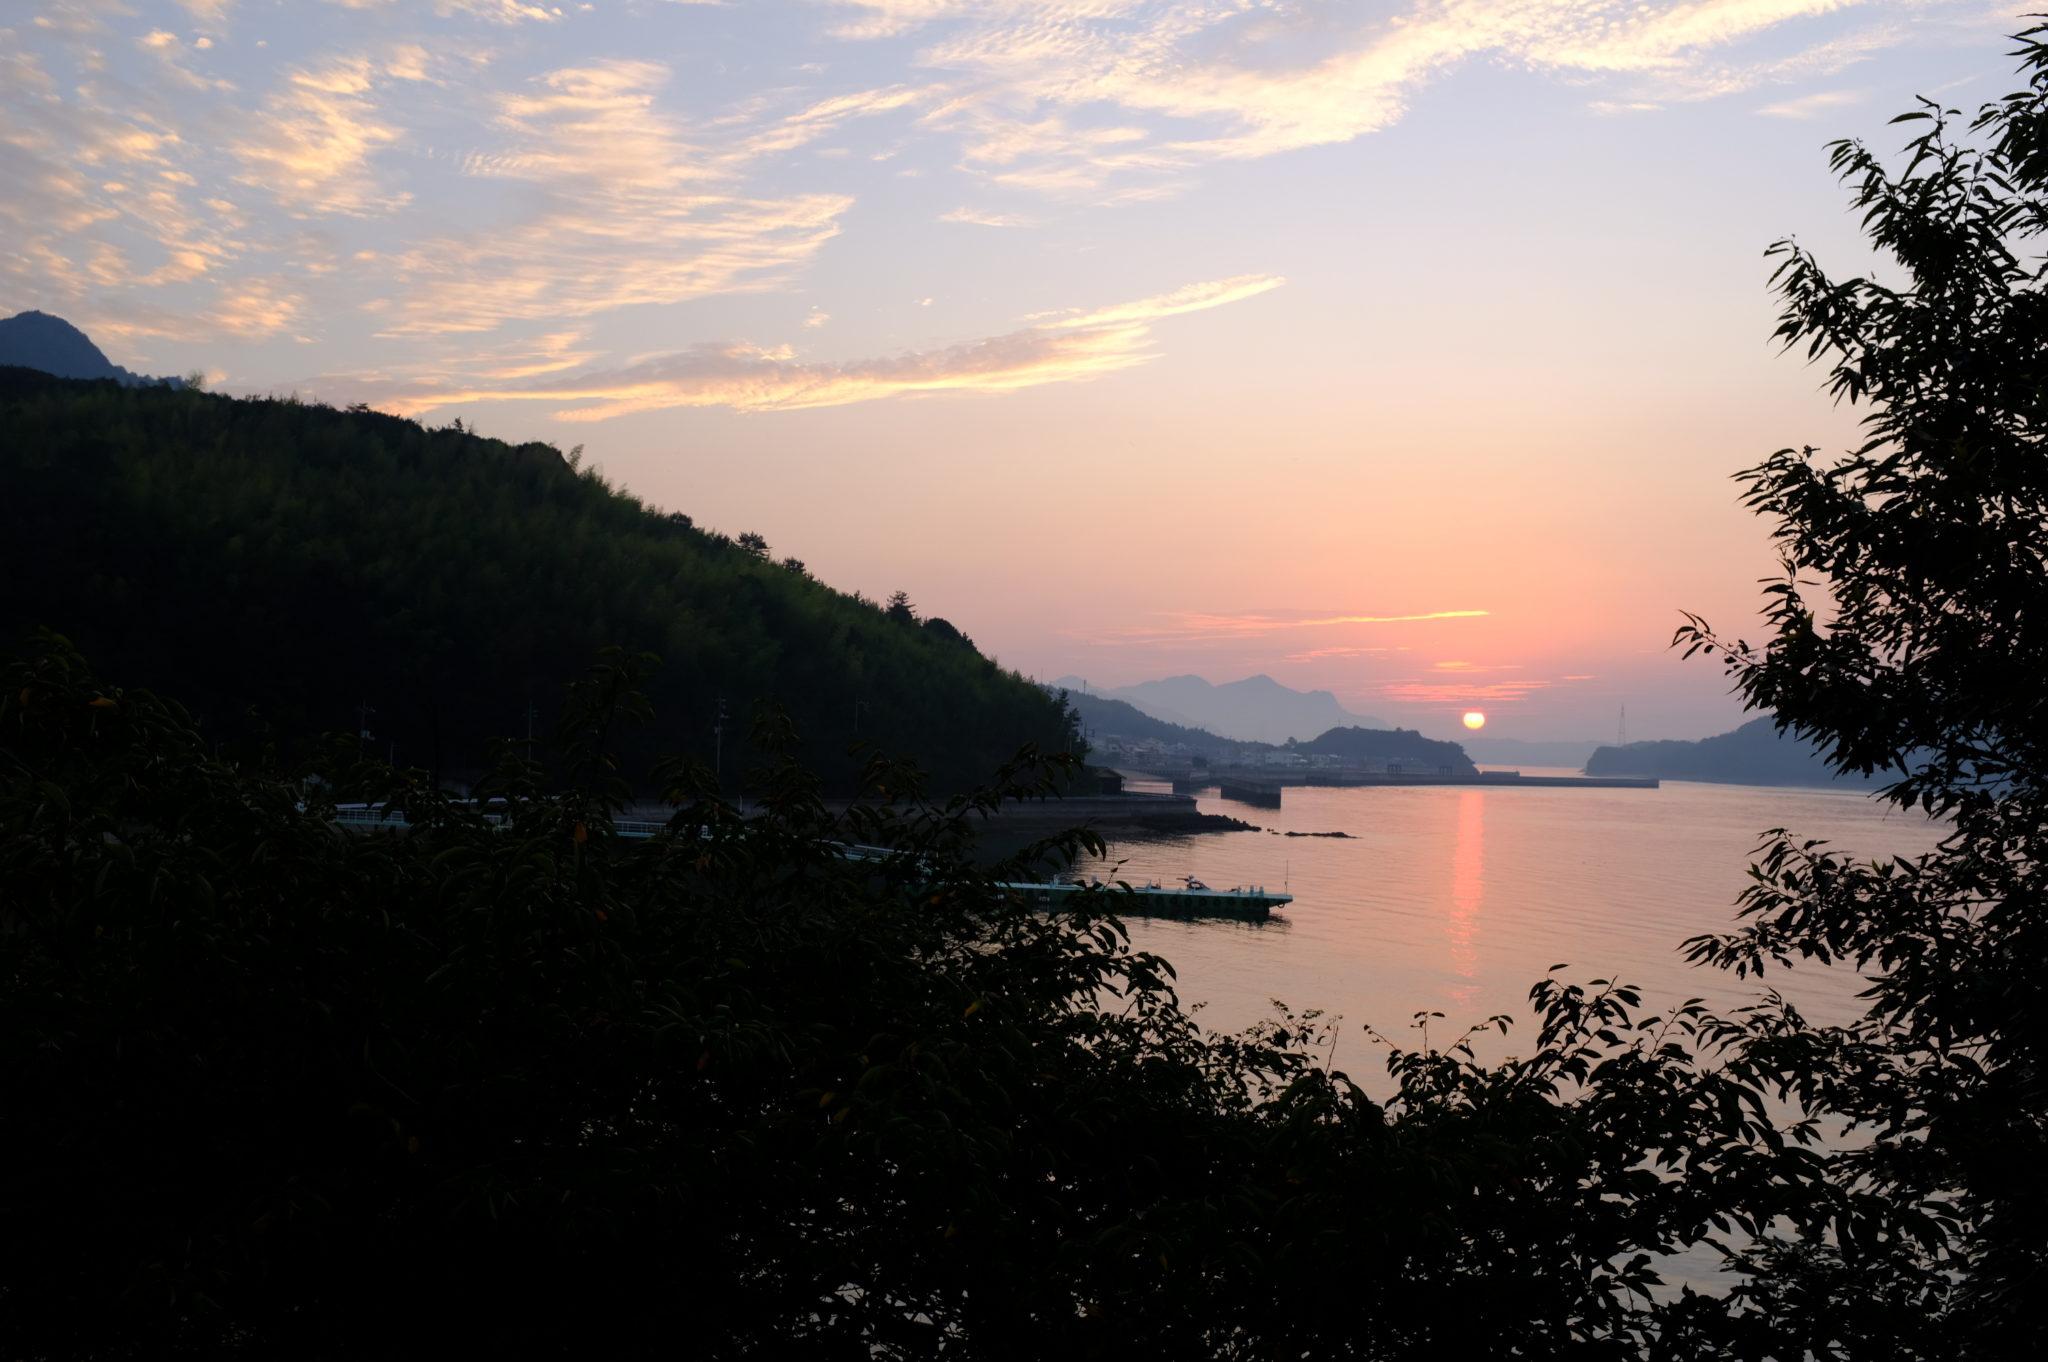 5 Uhr 33, Sonnenaufgang